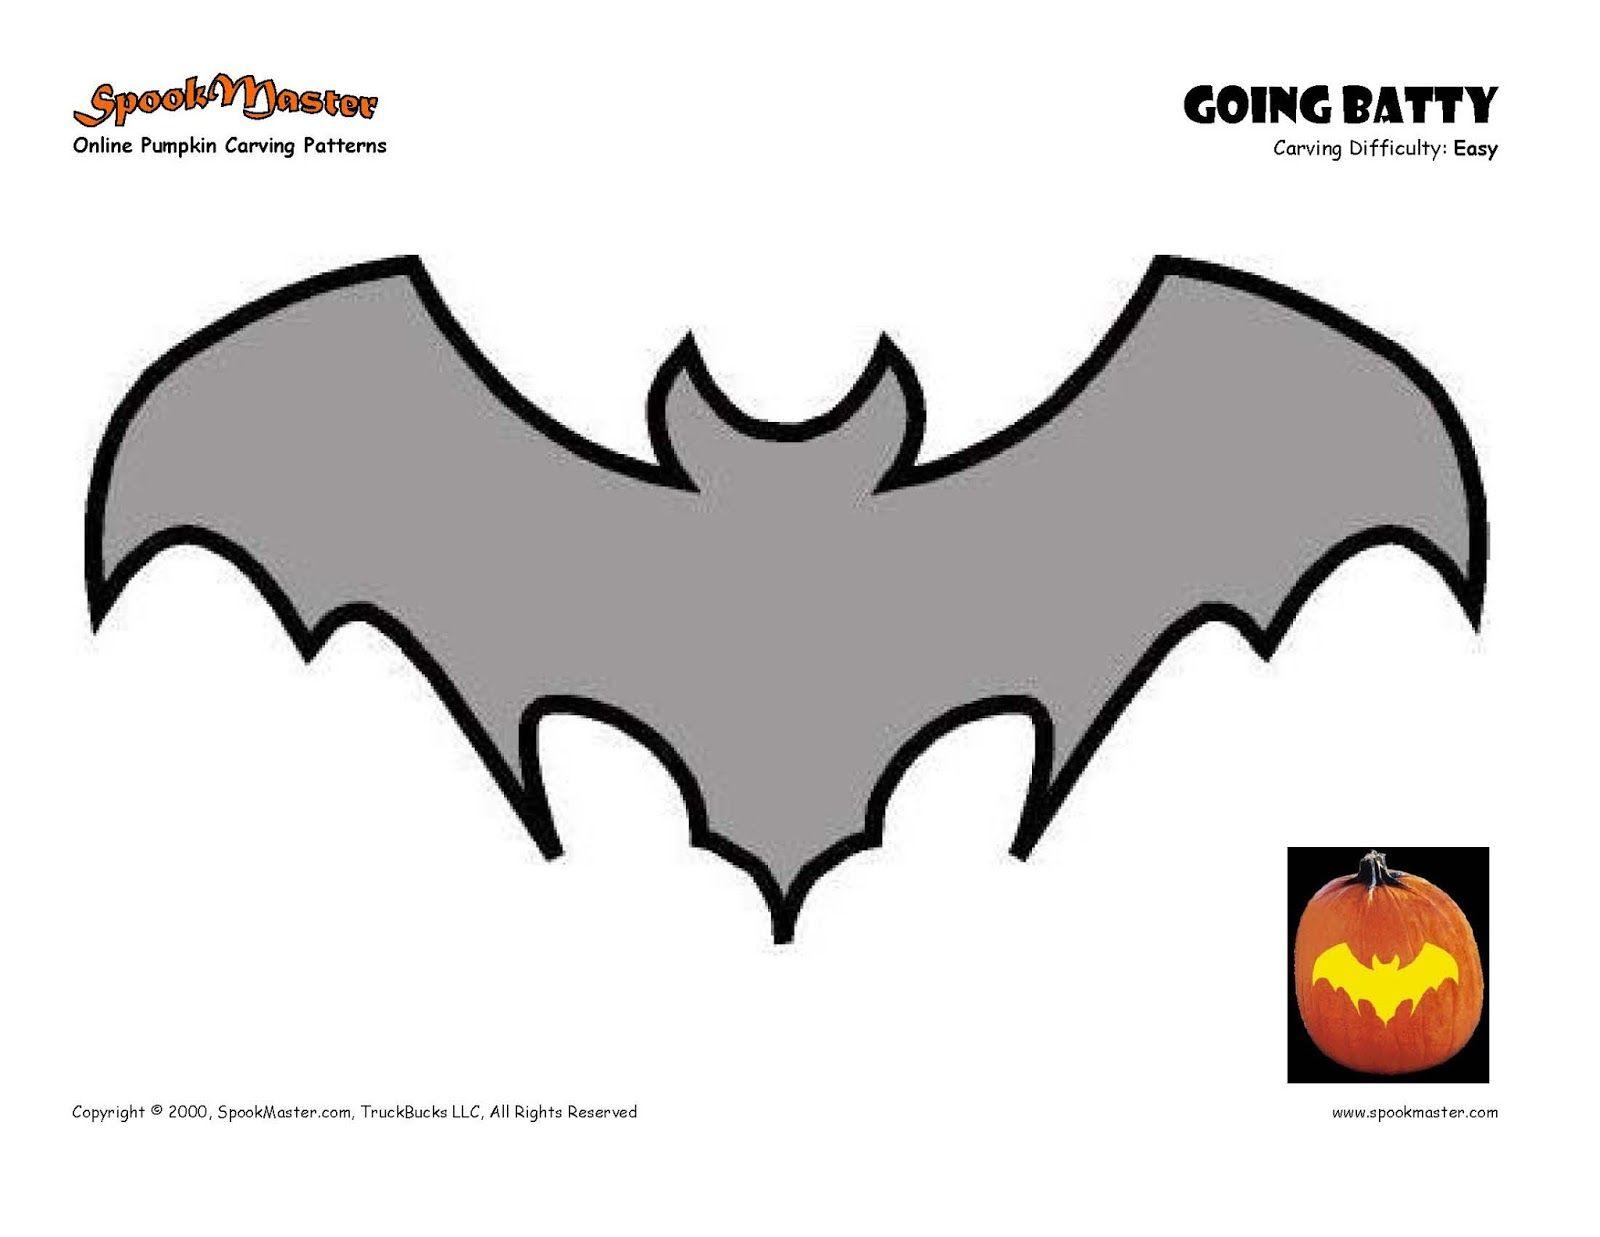 Free Printable Bat Pumpkin Carving Patterns Design Templates | Funny - Free Printable Pumpkin Carving Stencils For Kids